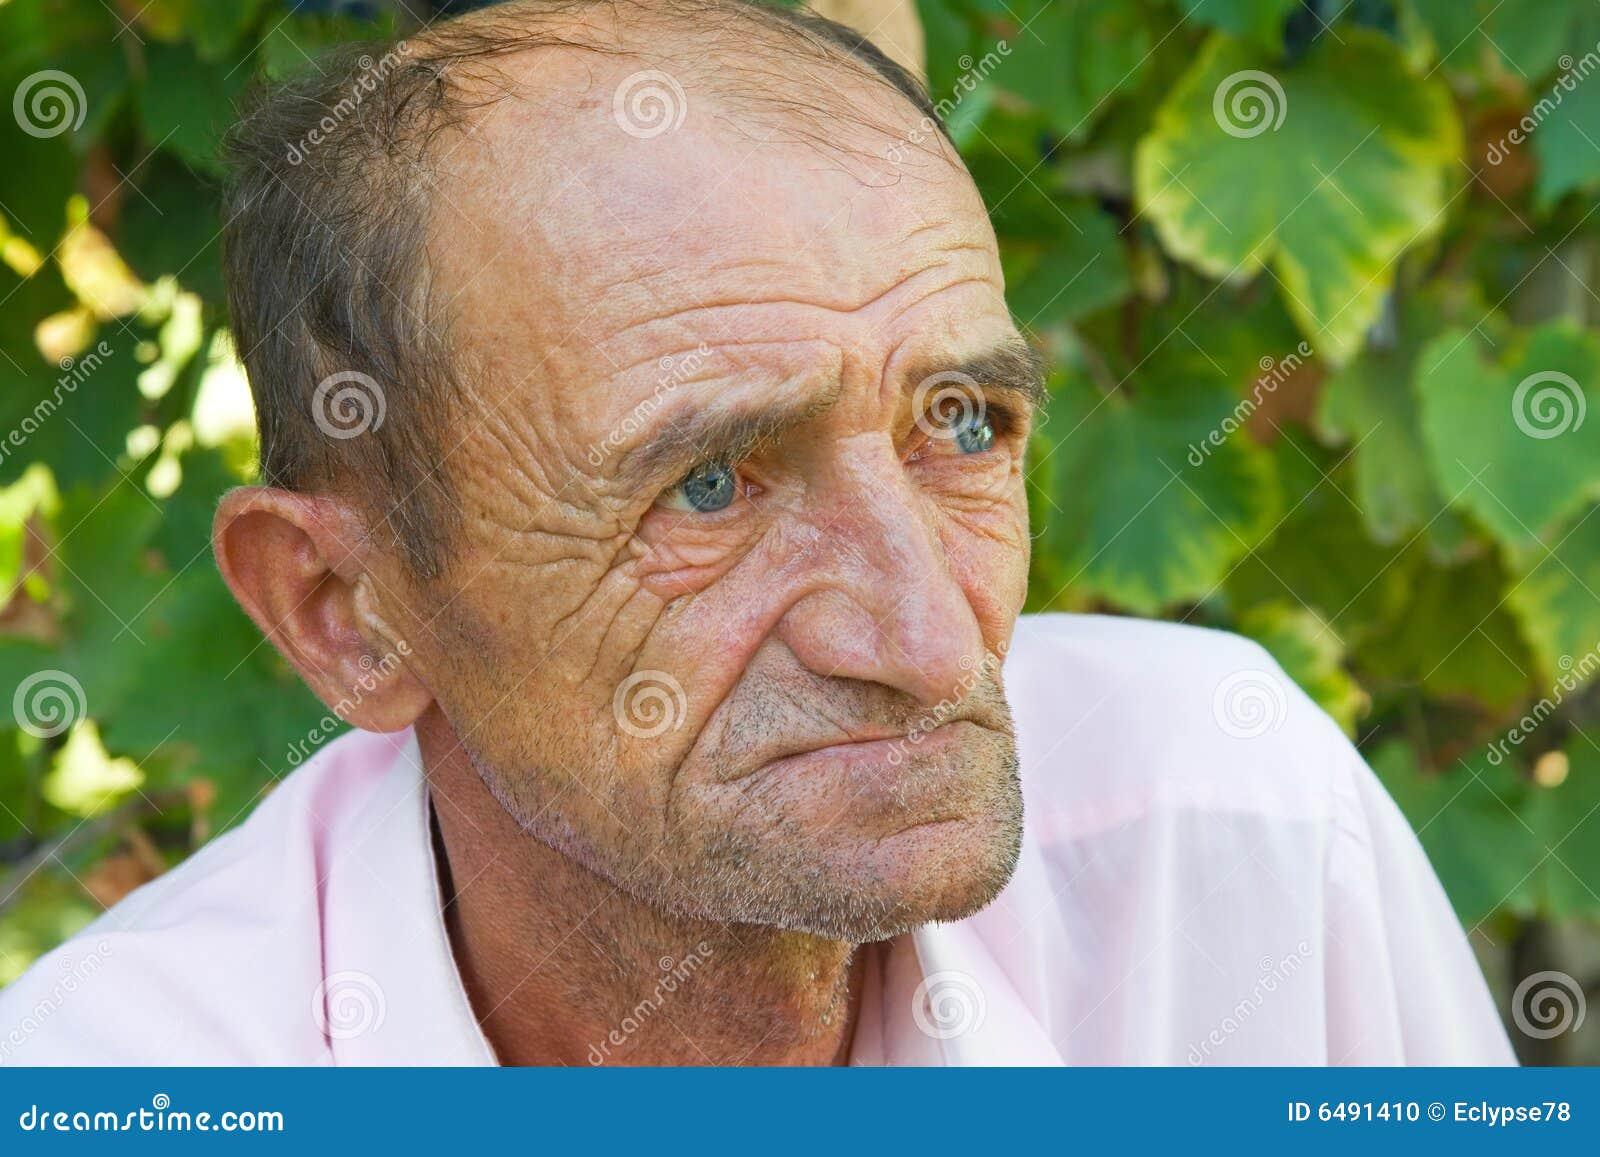 Sad old man